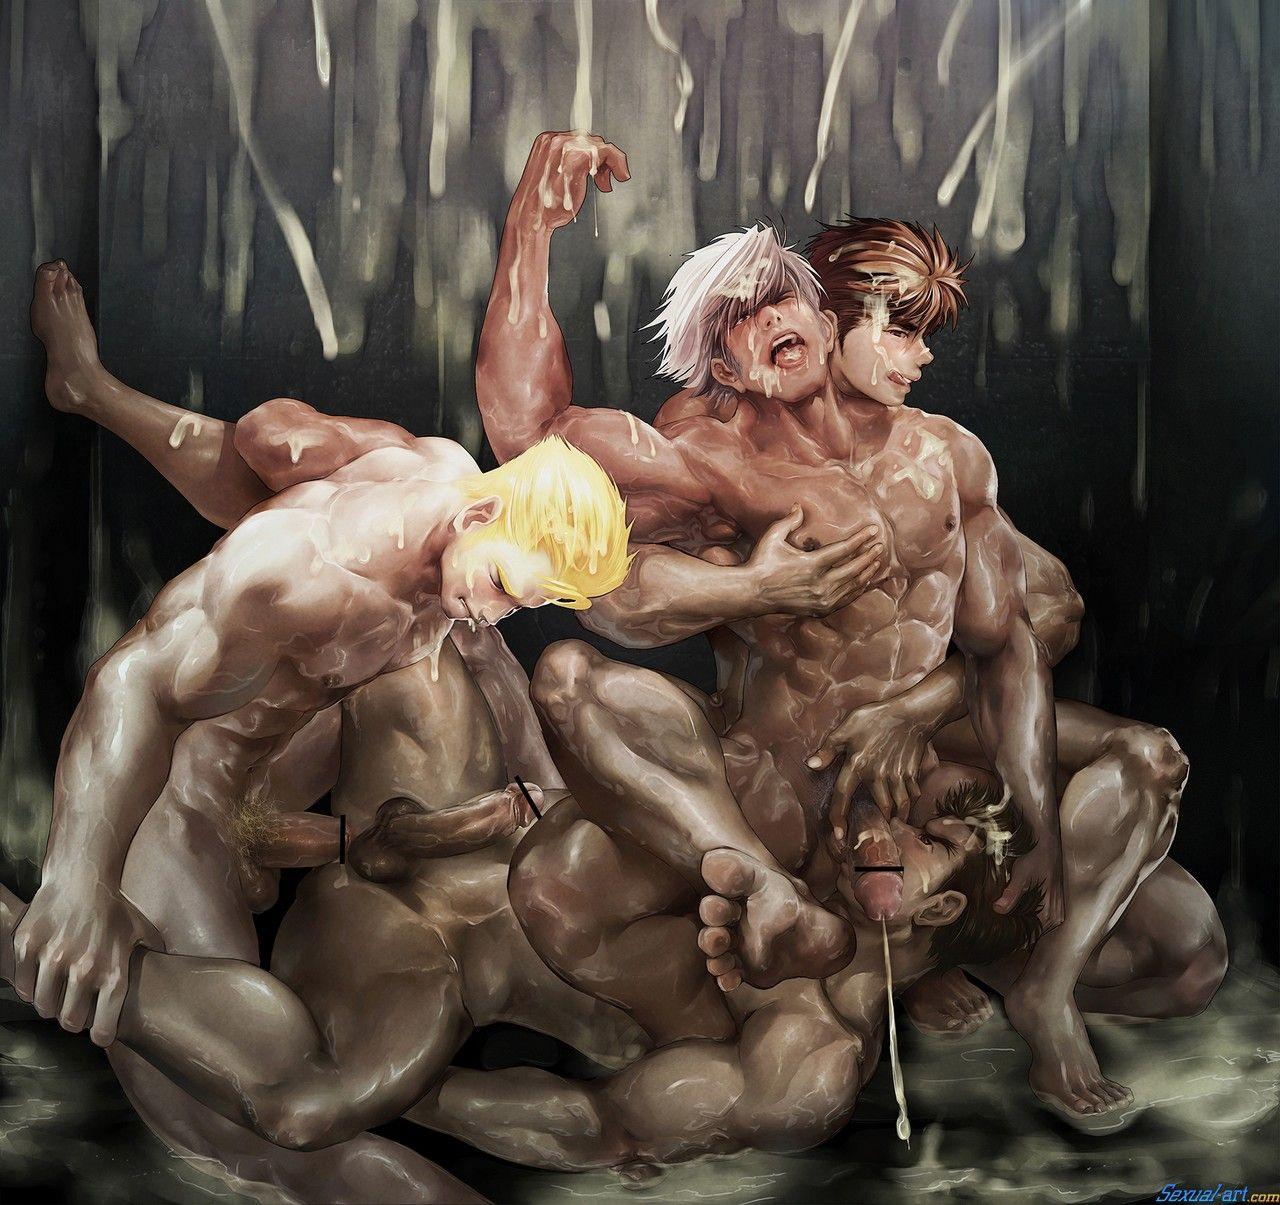 Порно Арты Геи